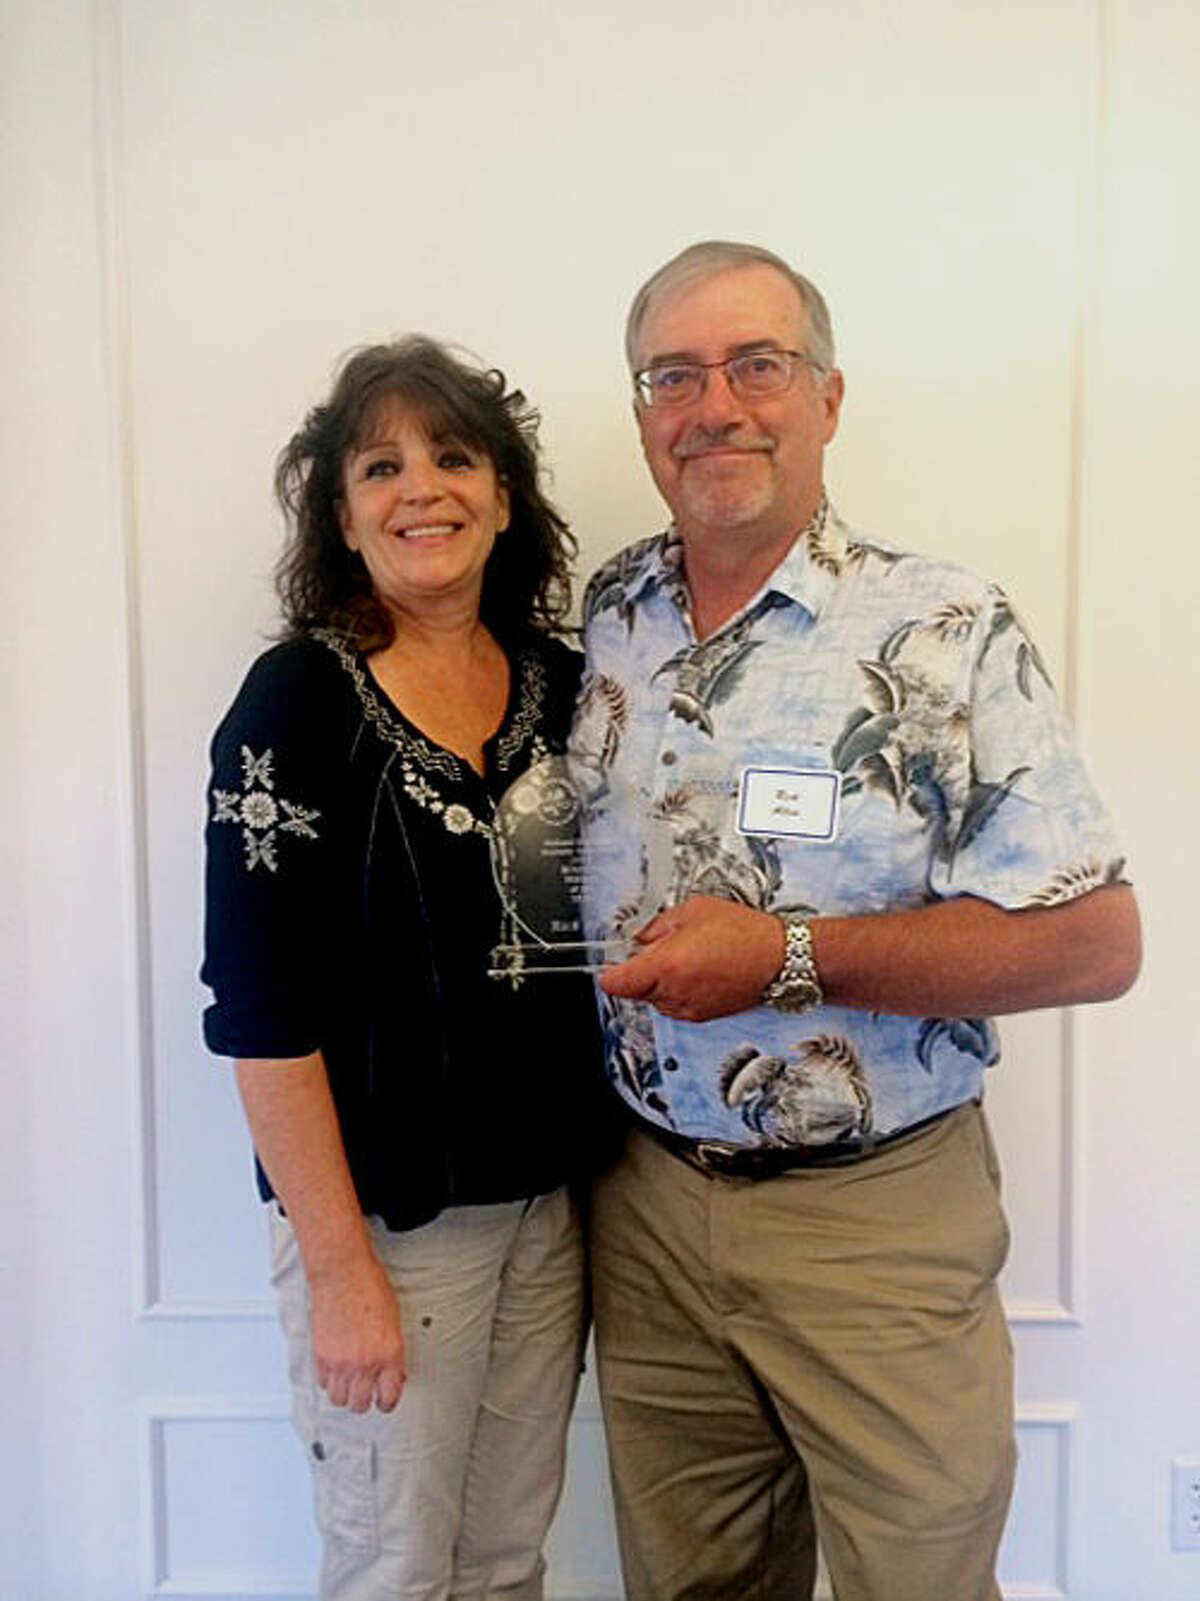 Rick Allen and his wife, Deanna Allen.